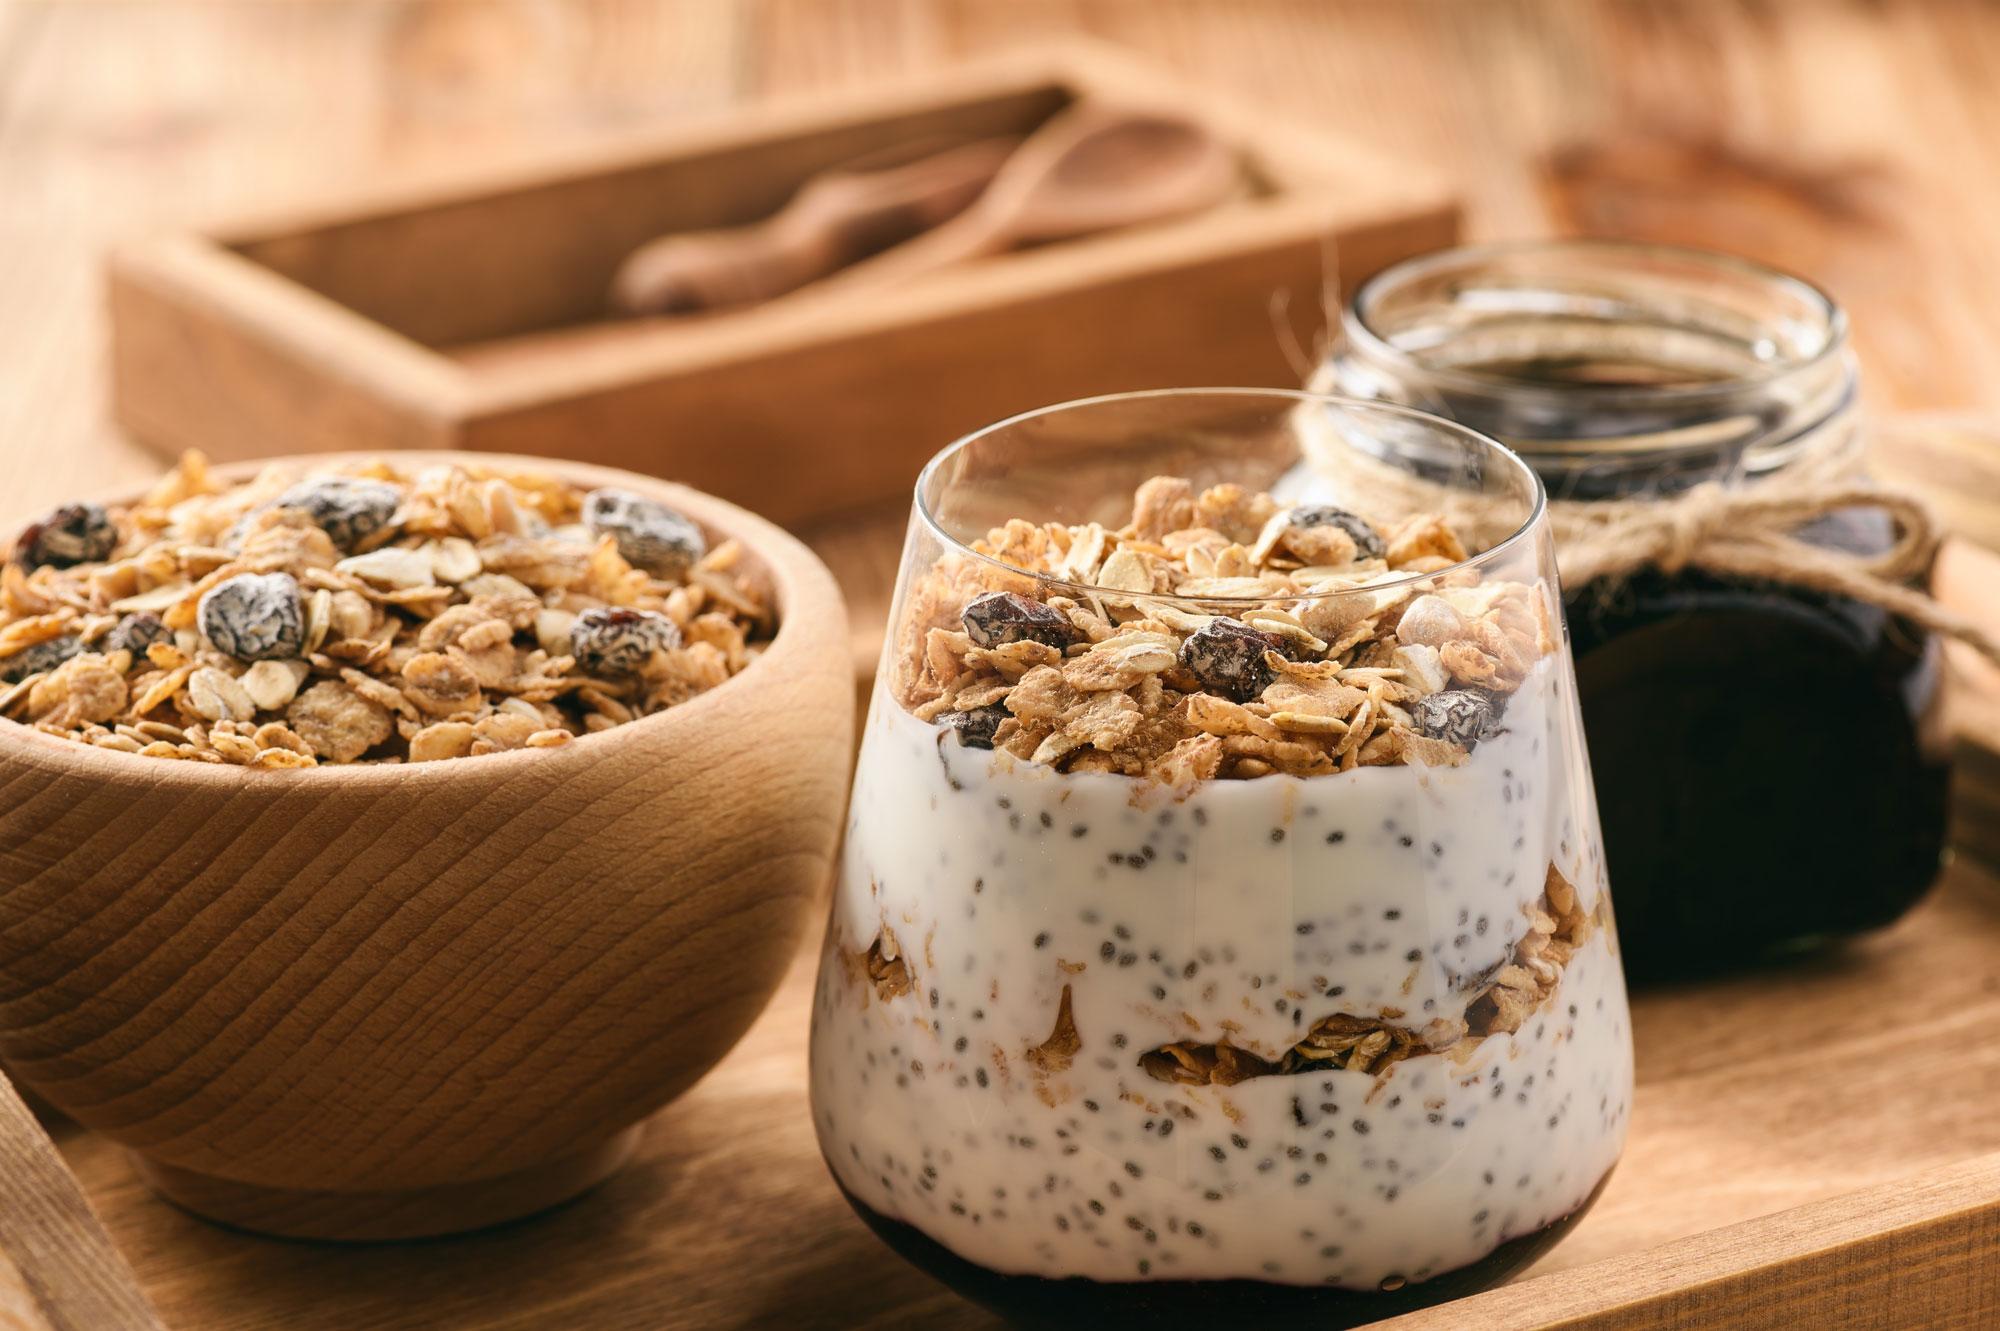 yogurt-vegano-con-musli-e-frutta-fresca